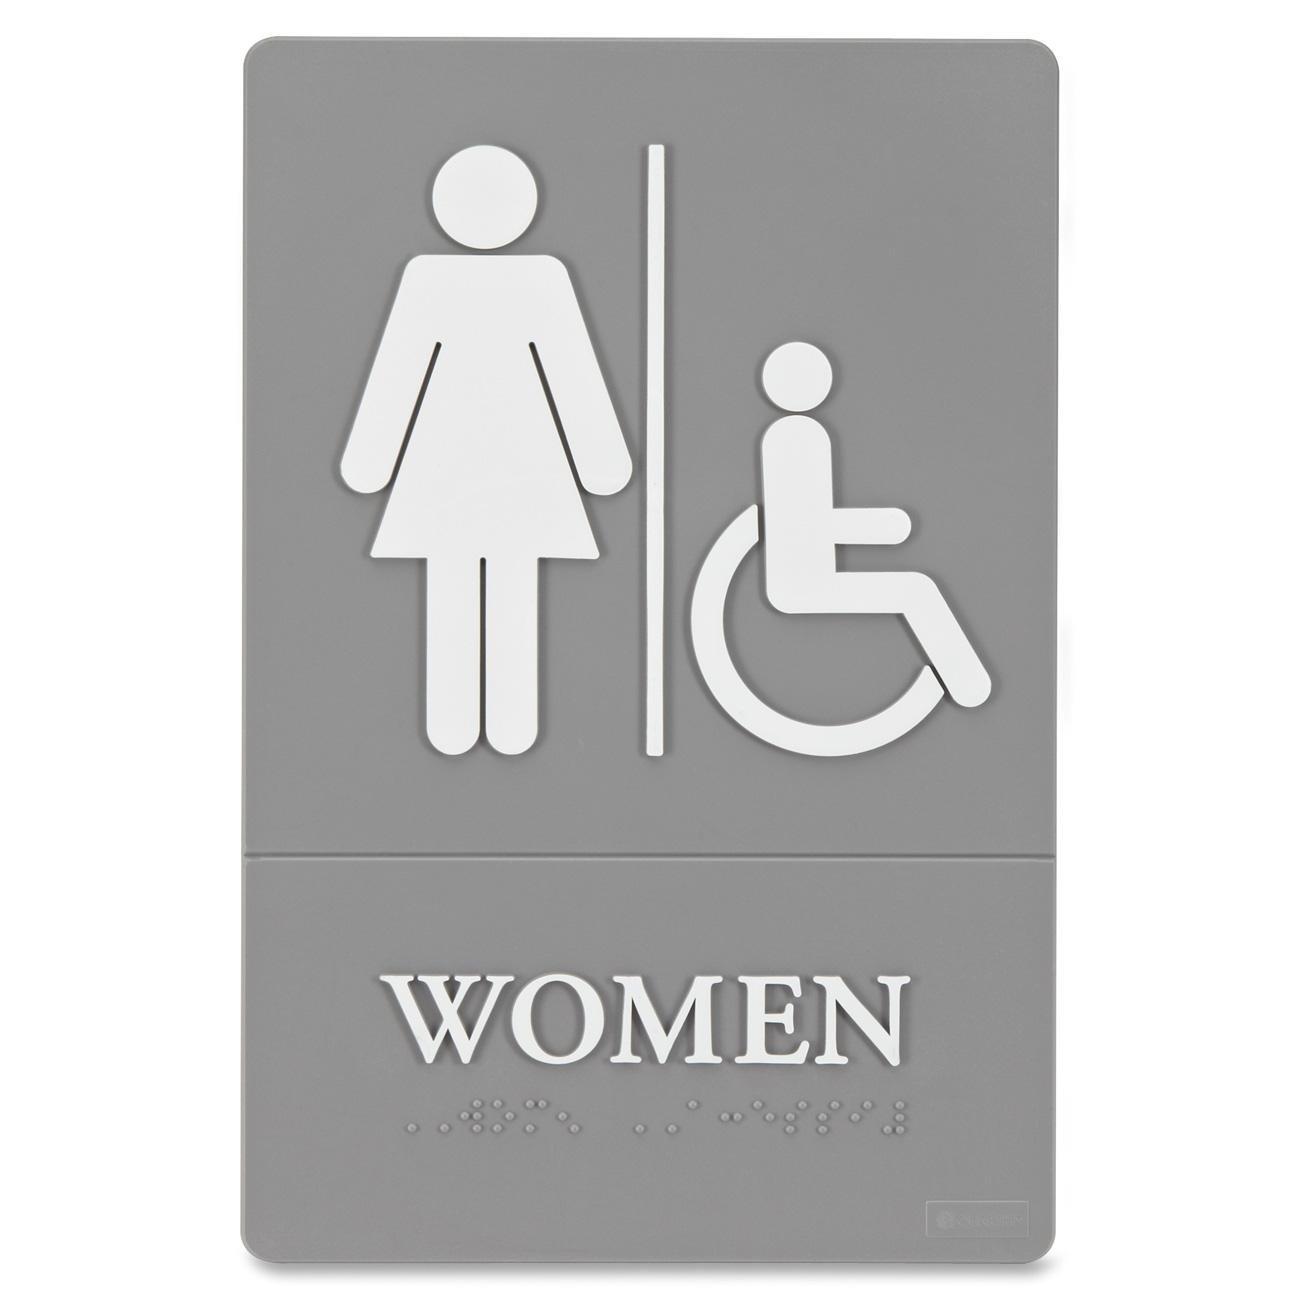 "Quartet Women Bathroom Sign, Handicap Accessible, ADA Approved, 6"" x 9"", Grade 2 Braille, Womens Restroom (01415)"